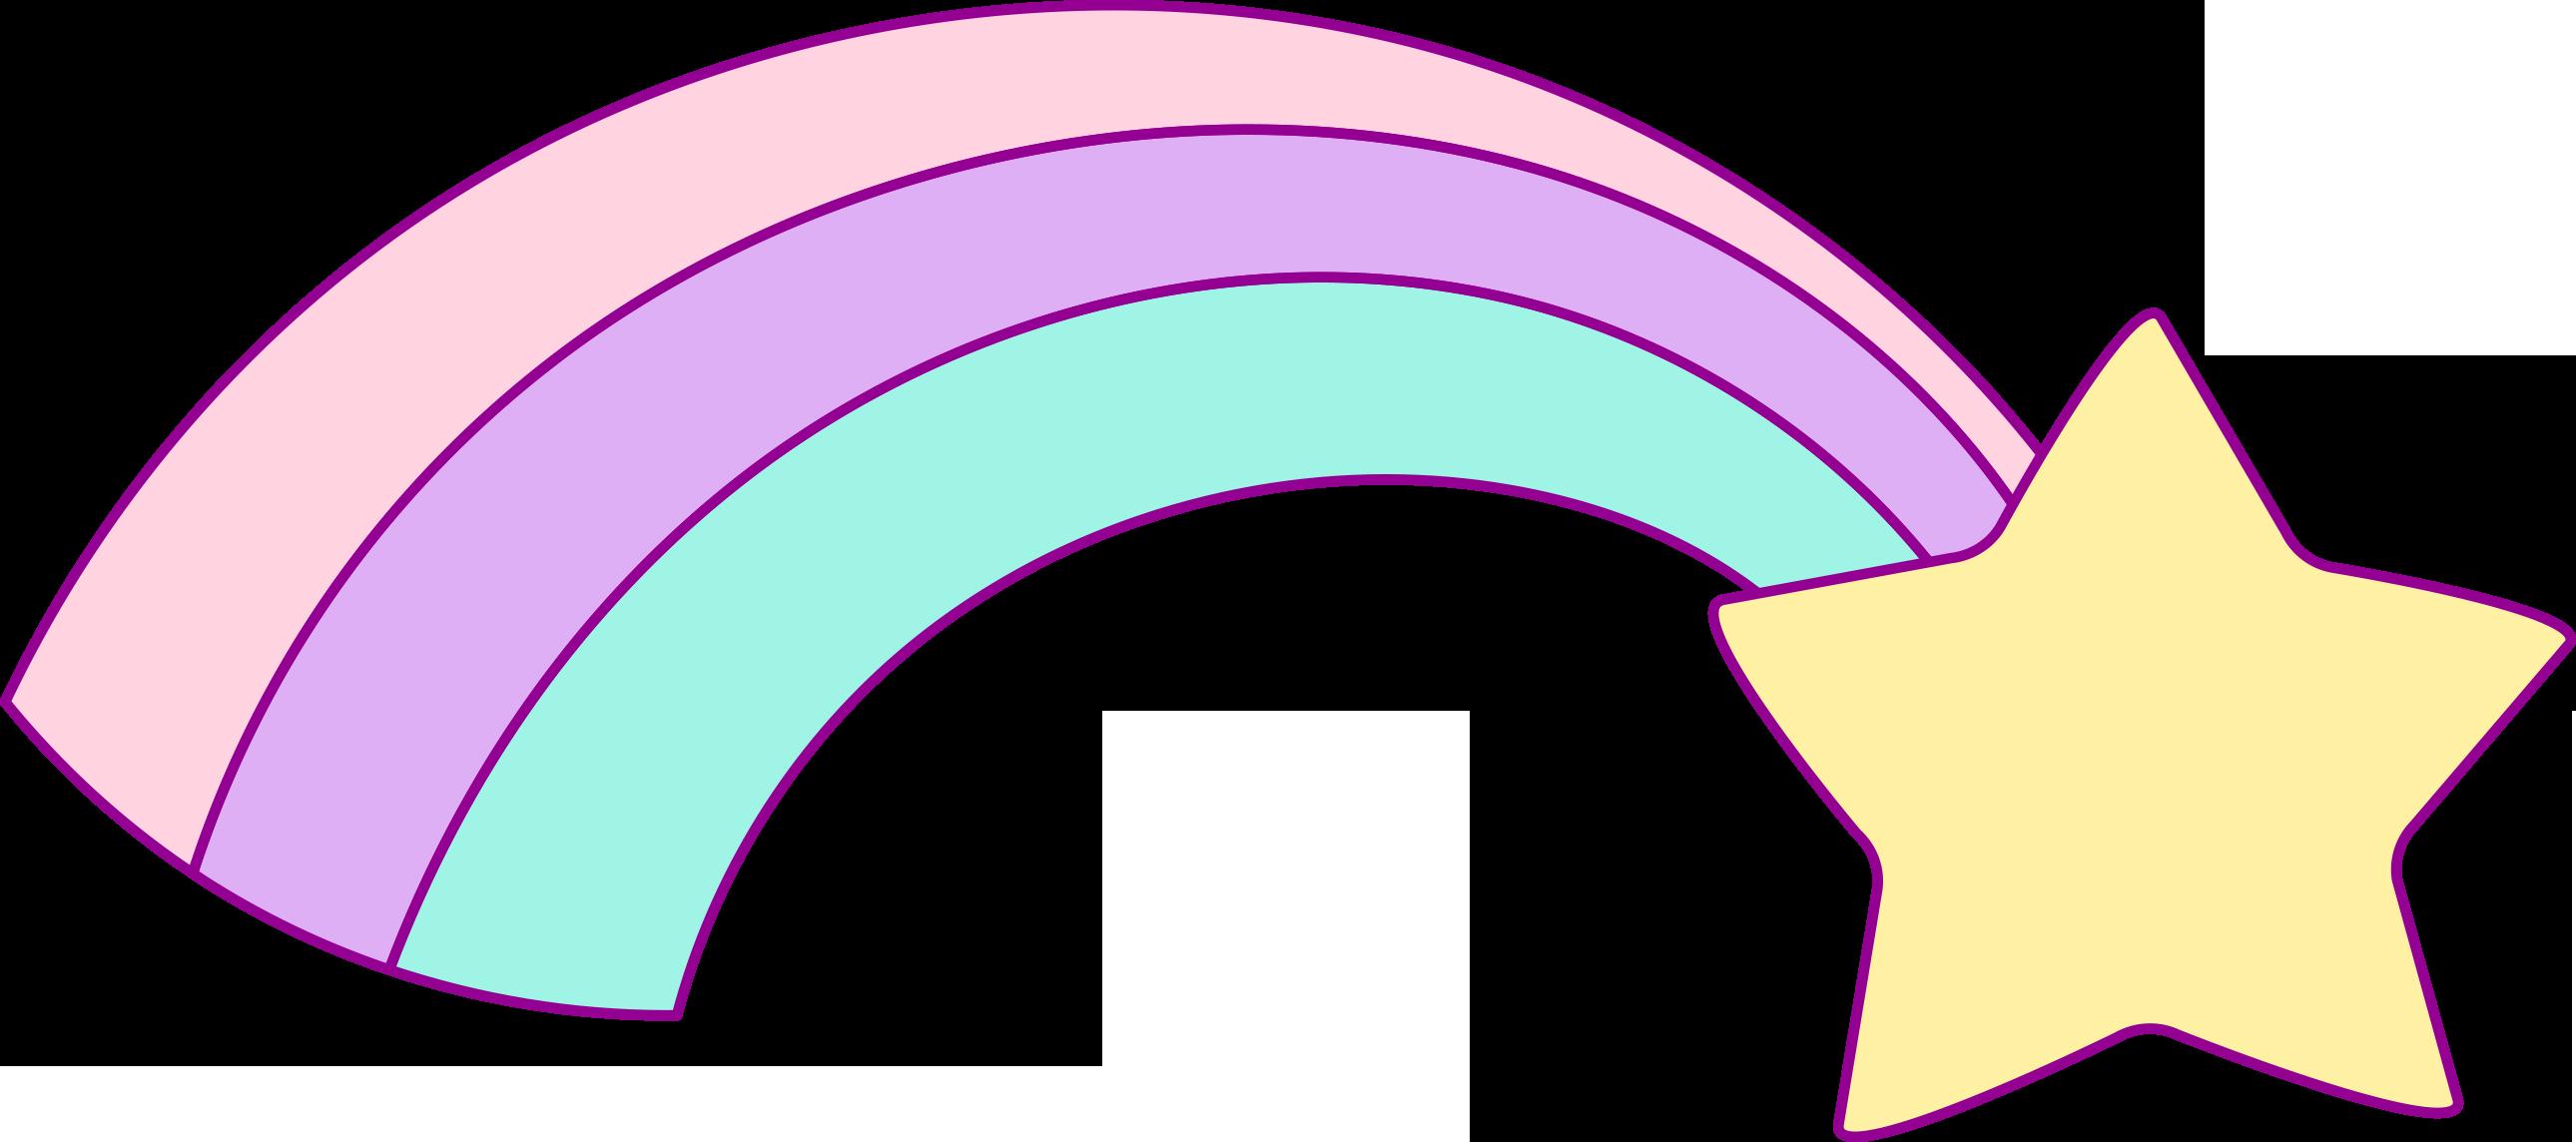 2580x1144 Free Hand Drawn Unicorn Clip Art